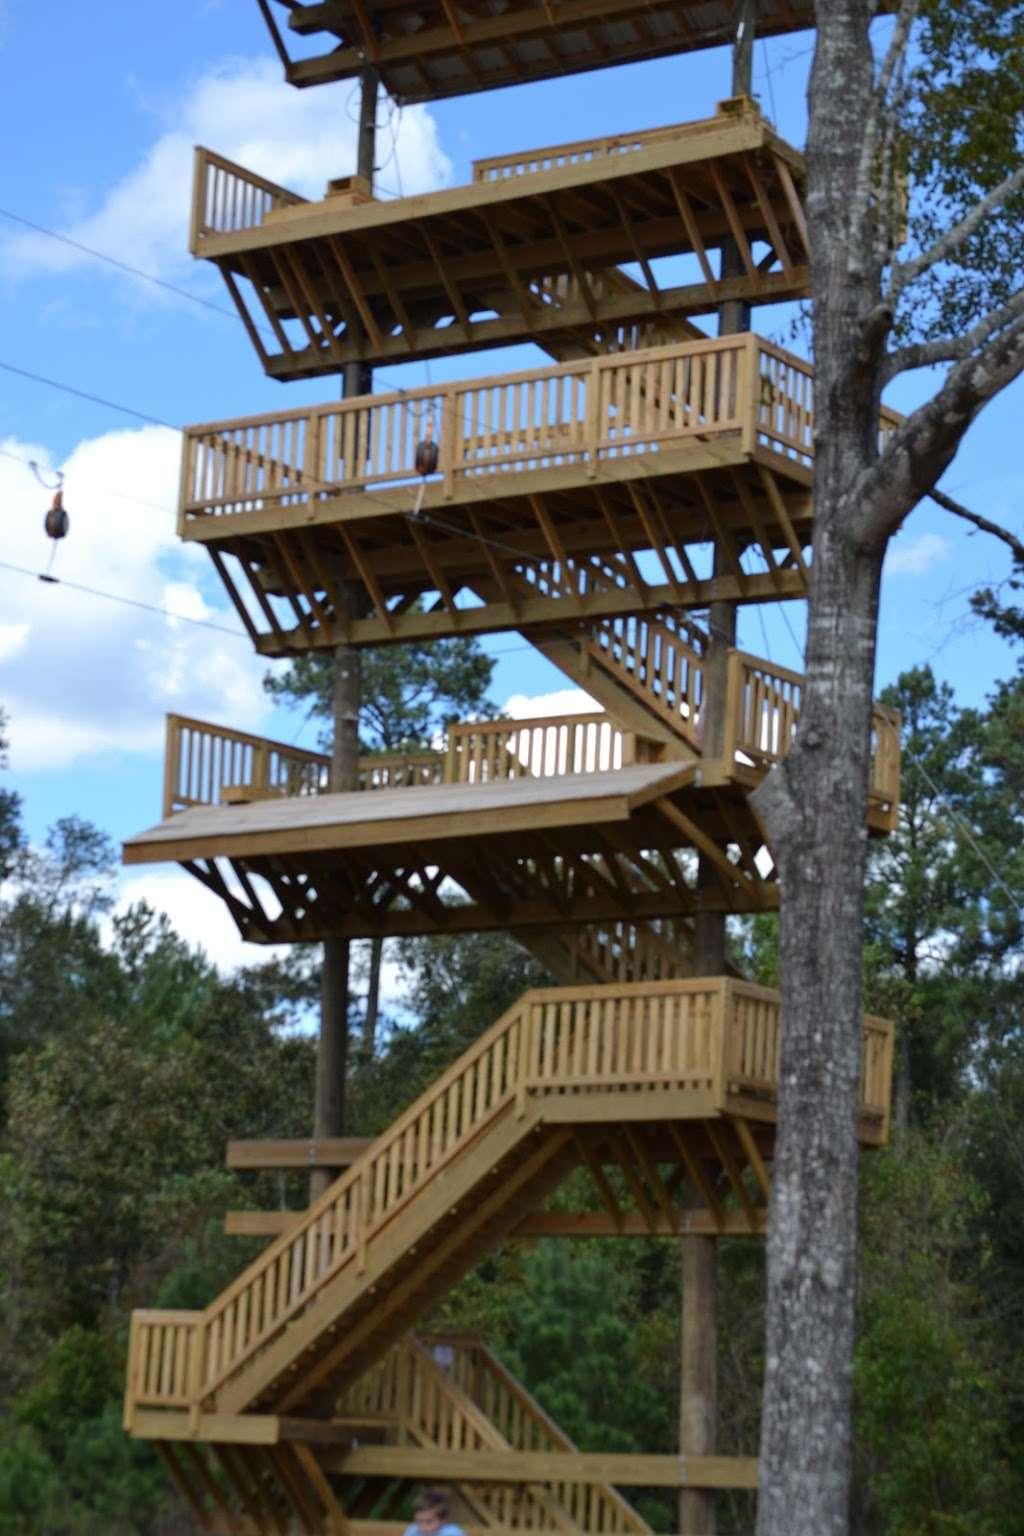 Big Rivers Waterpark - amusement park  | Photo 5 of 10 | Address: 23101 TX-242, New Caney, TX 77357, USA | Phone: (832) 509-1556